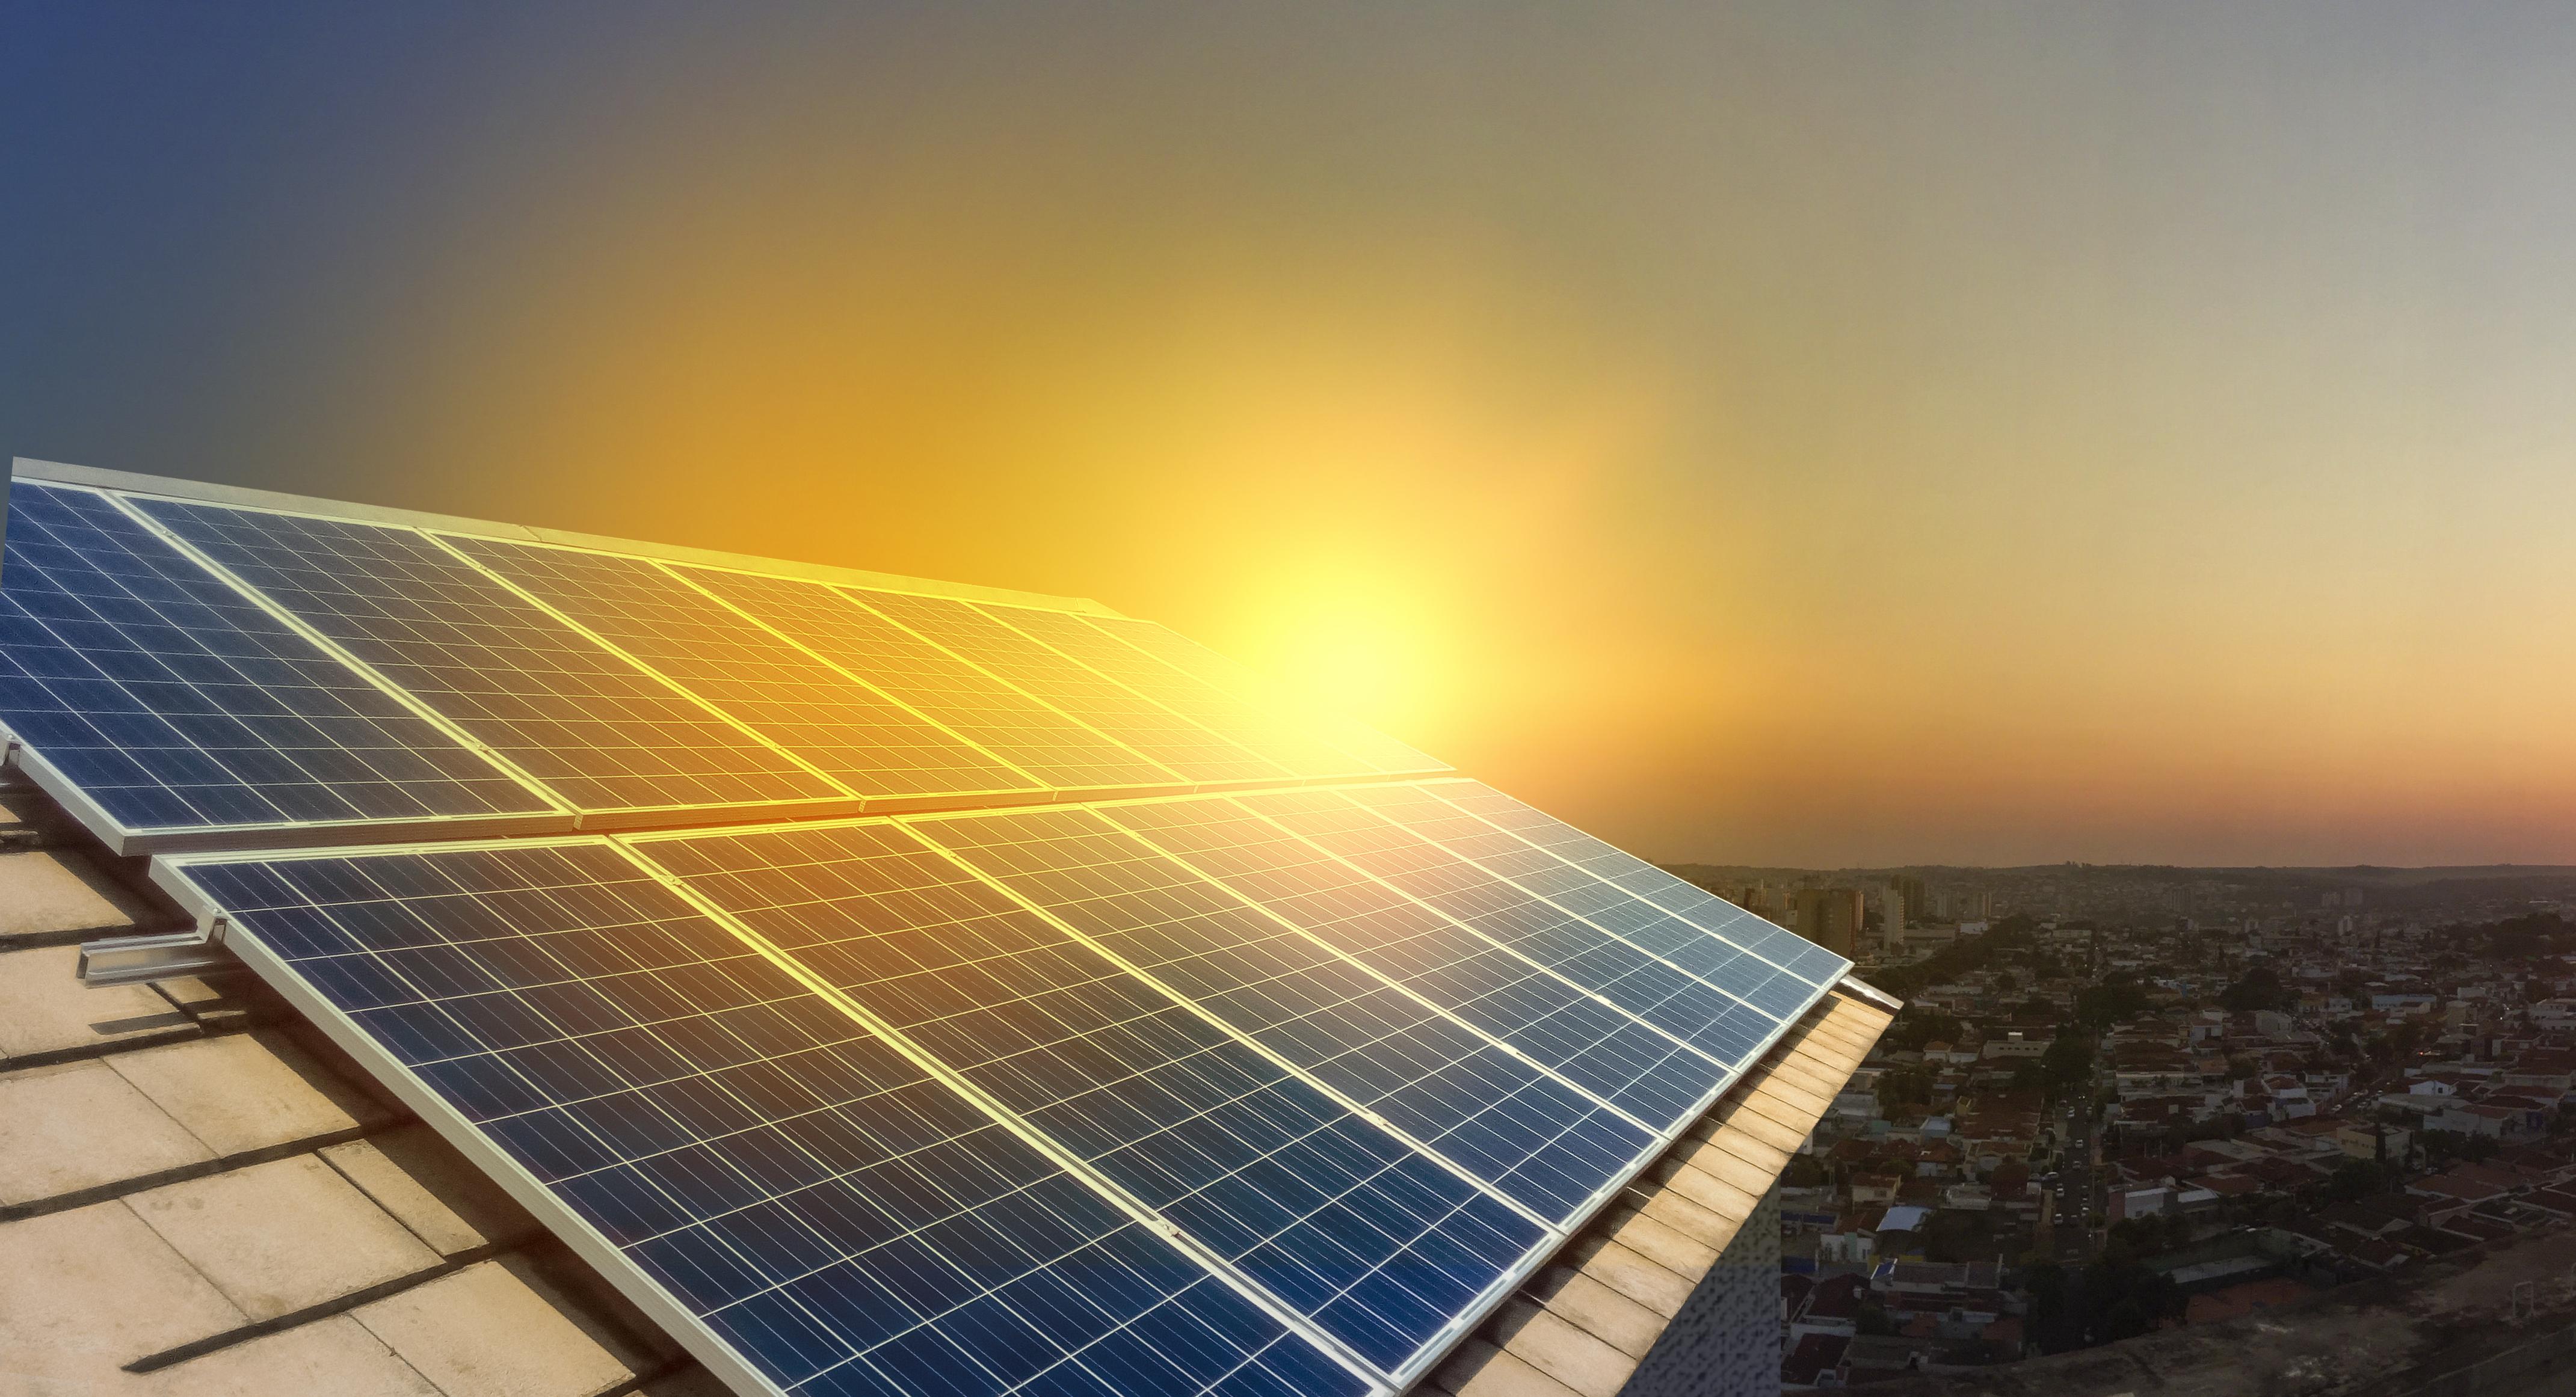 3 Top Solar Stocks To Buy Now The Motley Fool